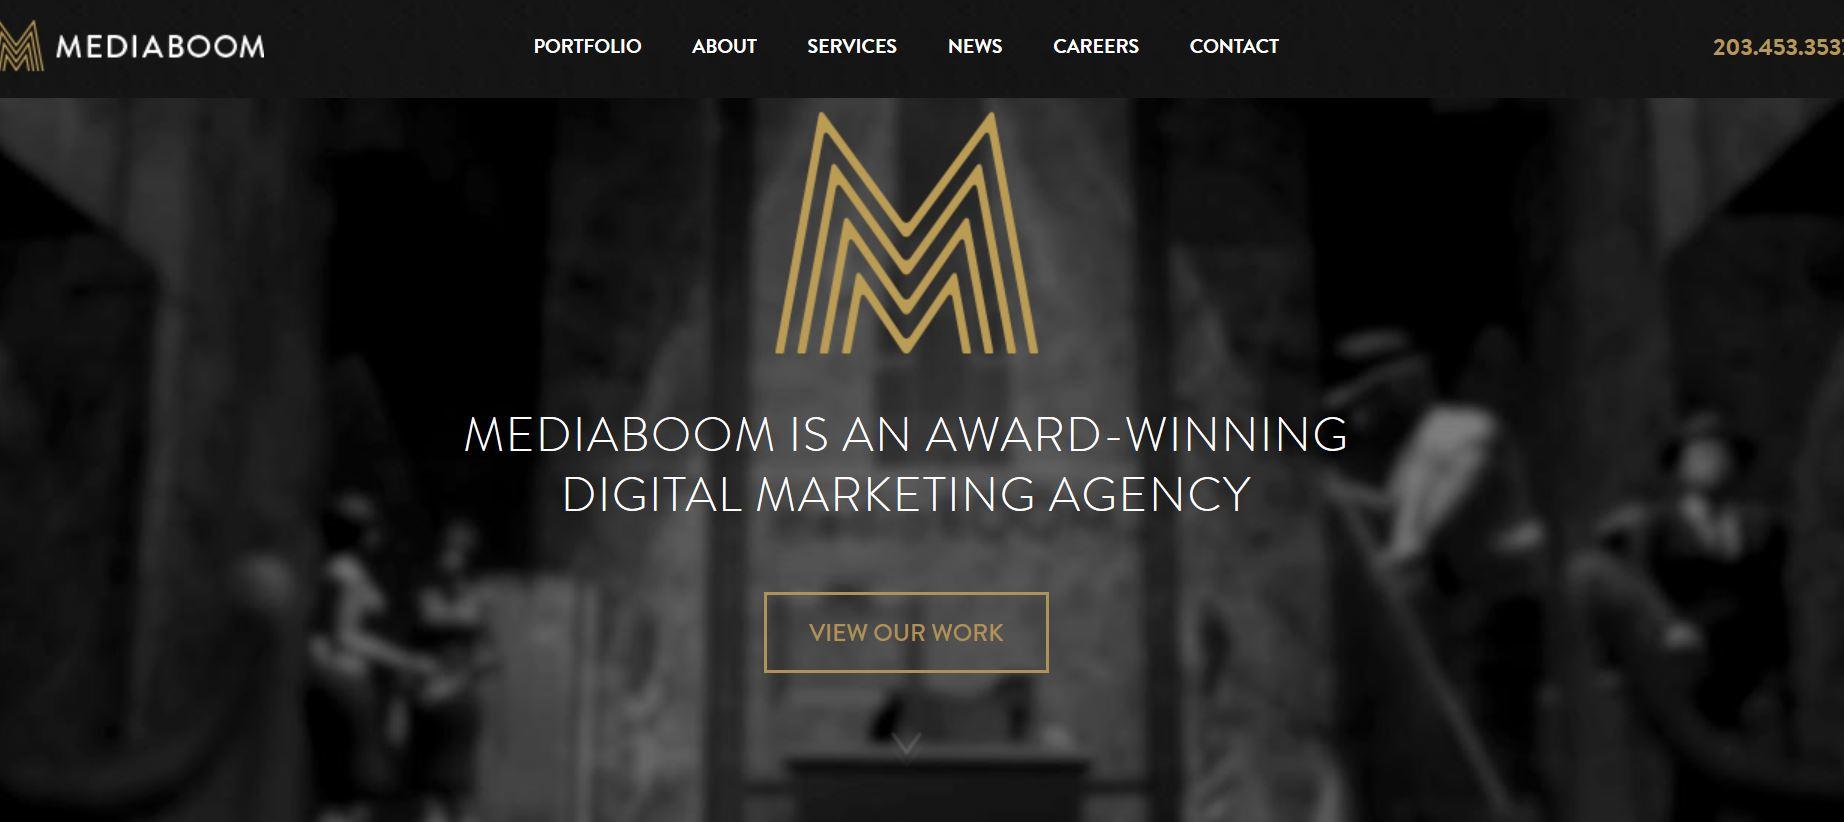 homepage design trend 2016-2